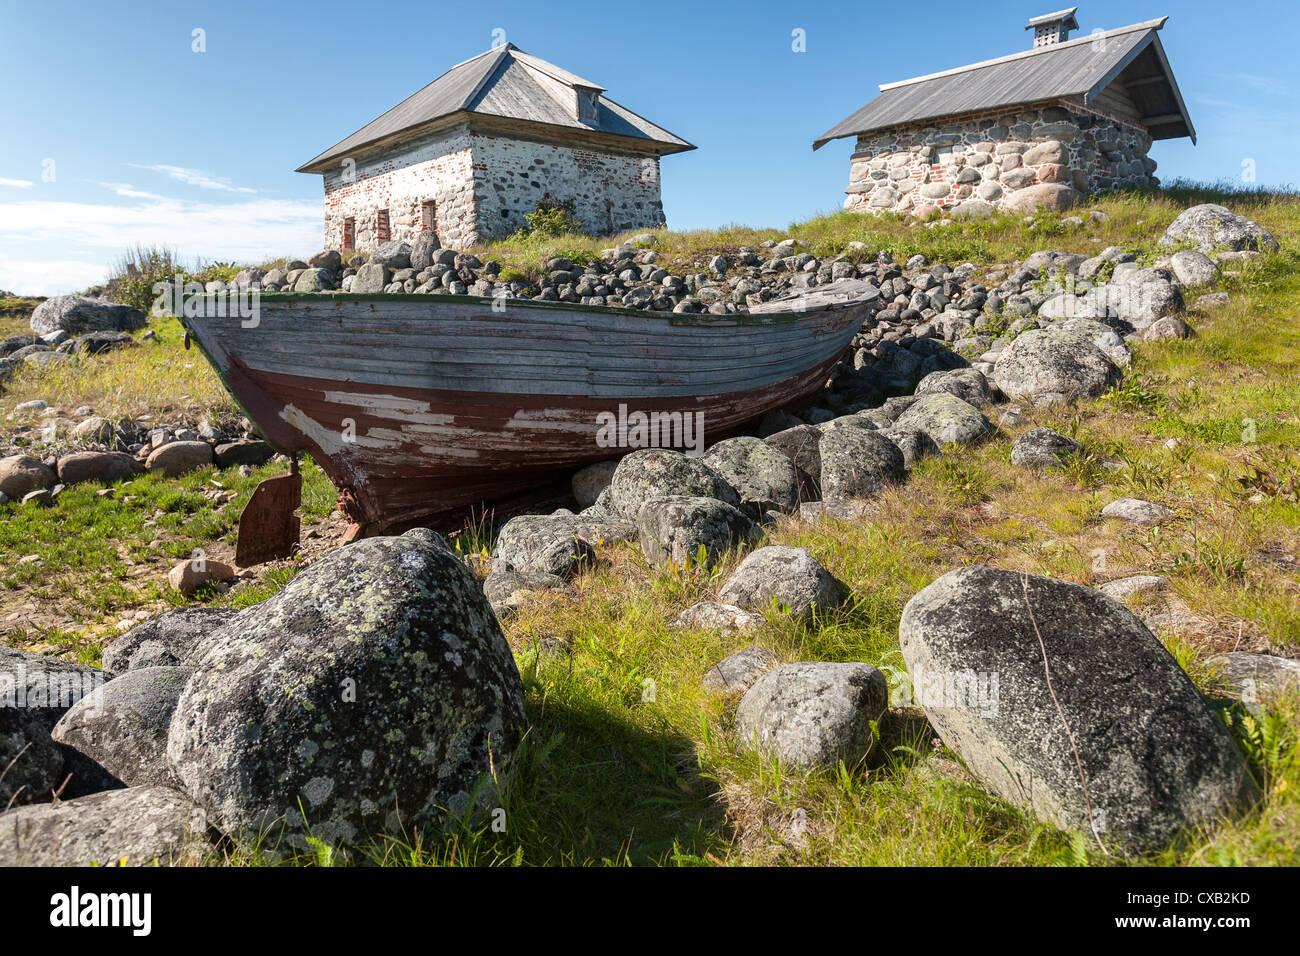 Old boat and stone houses on the shore. Bolshoi Zayatsky Island, Solovetsky Islands, The White Sea, Karelia, Russia. Stock Photo